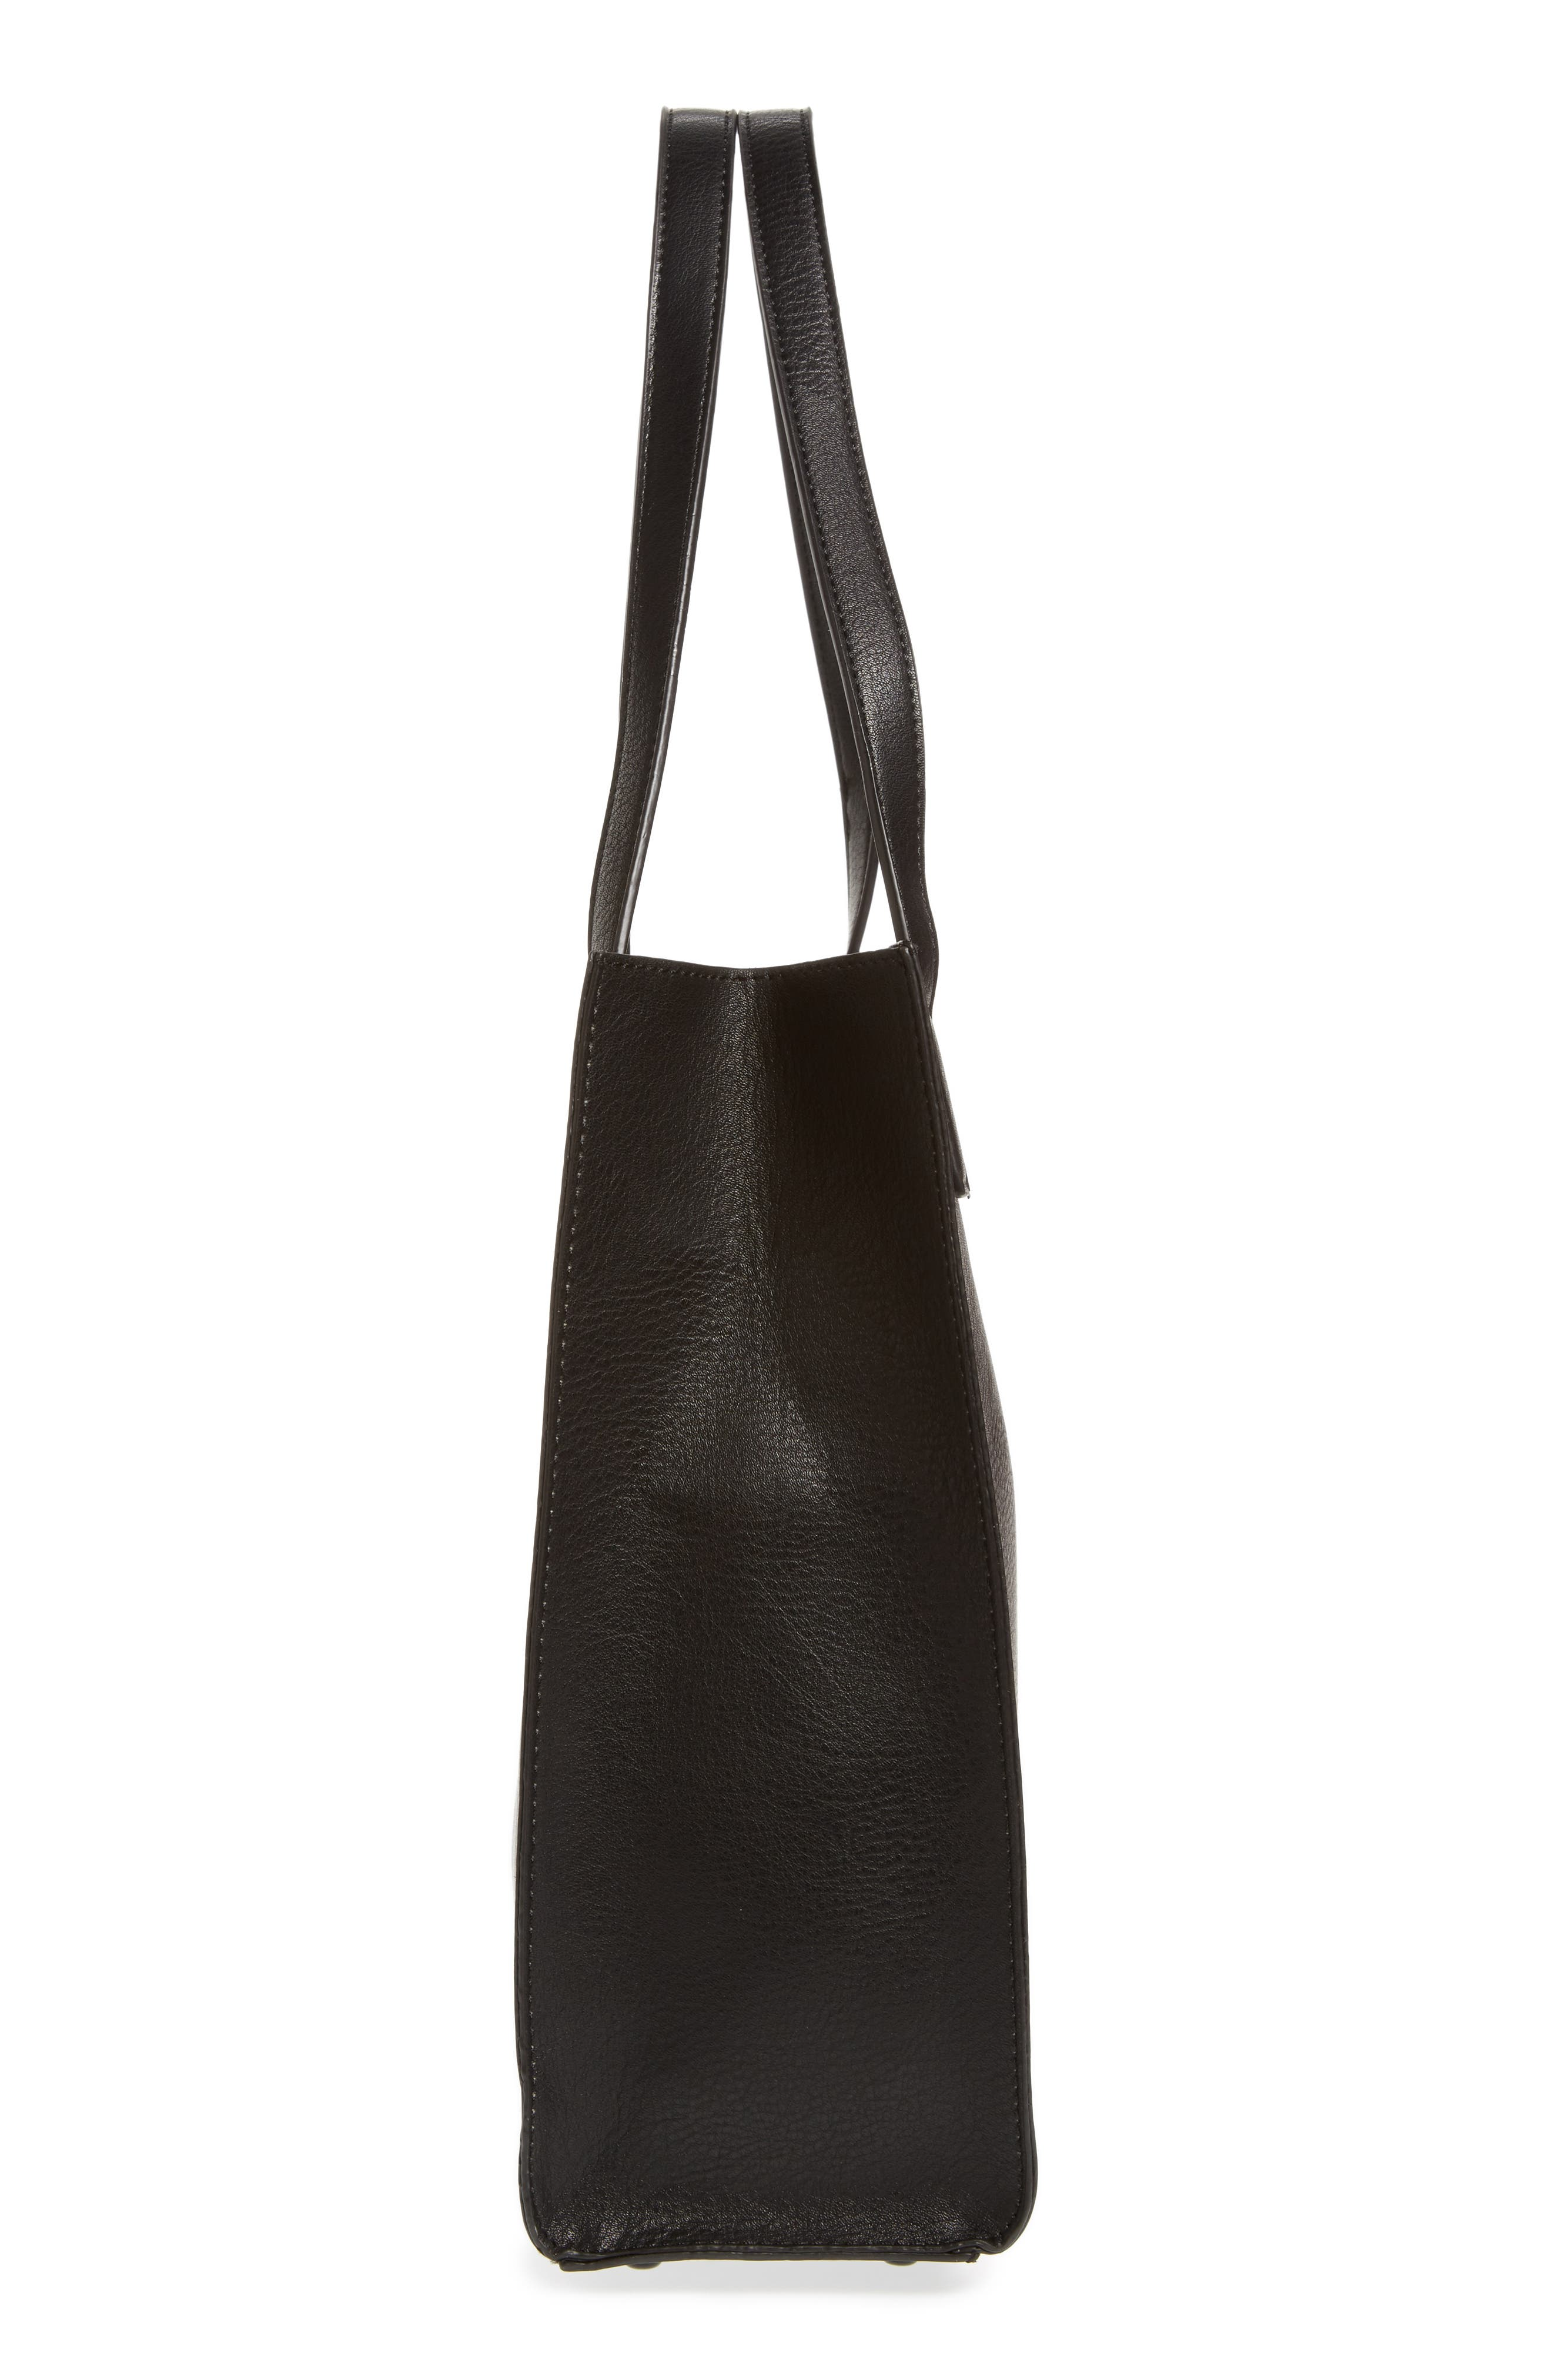 Alicia Faux Leather Tote Bag & Pouch Set,                             Alternate thumbnail 5, color,                             001